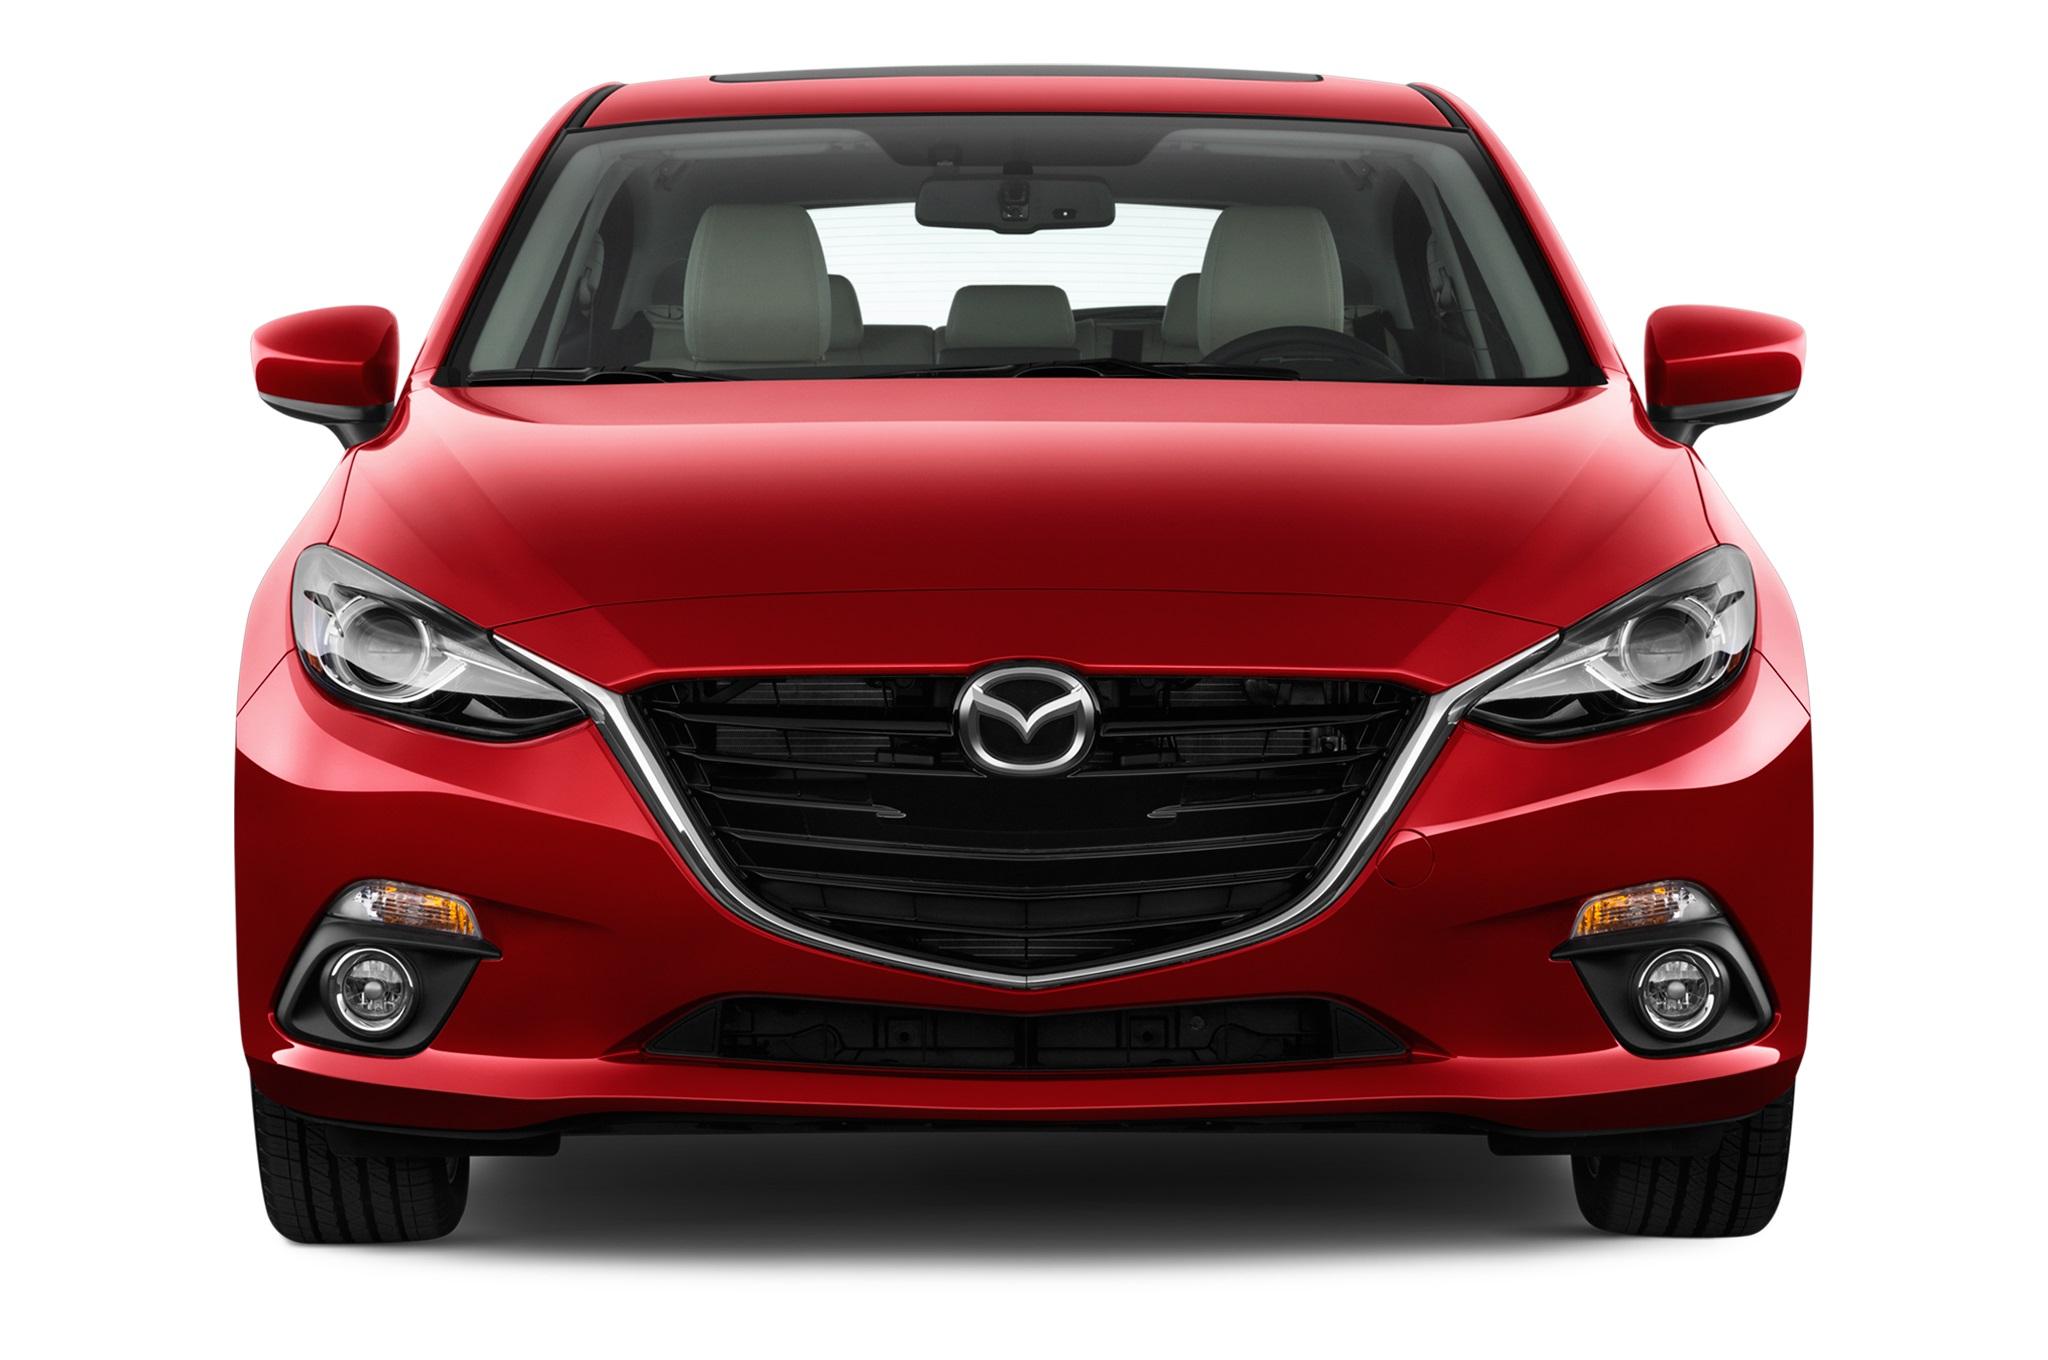 High Beam Led Headlights Conversion Kit For Mazda 3 2016